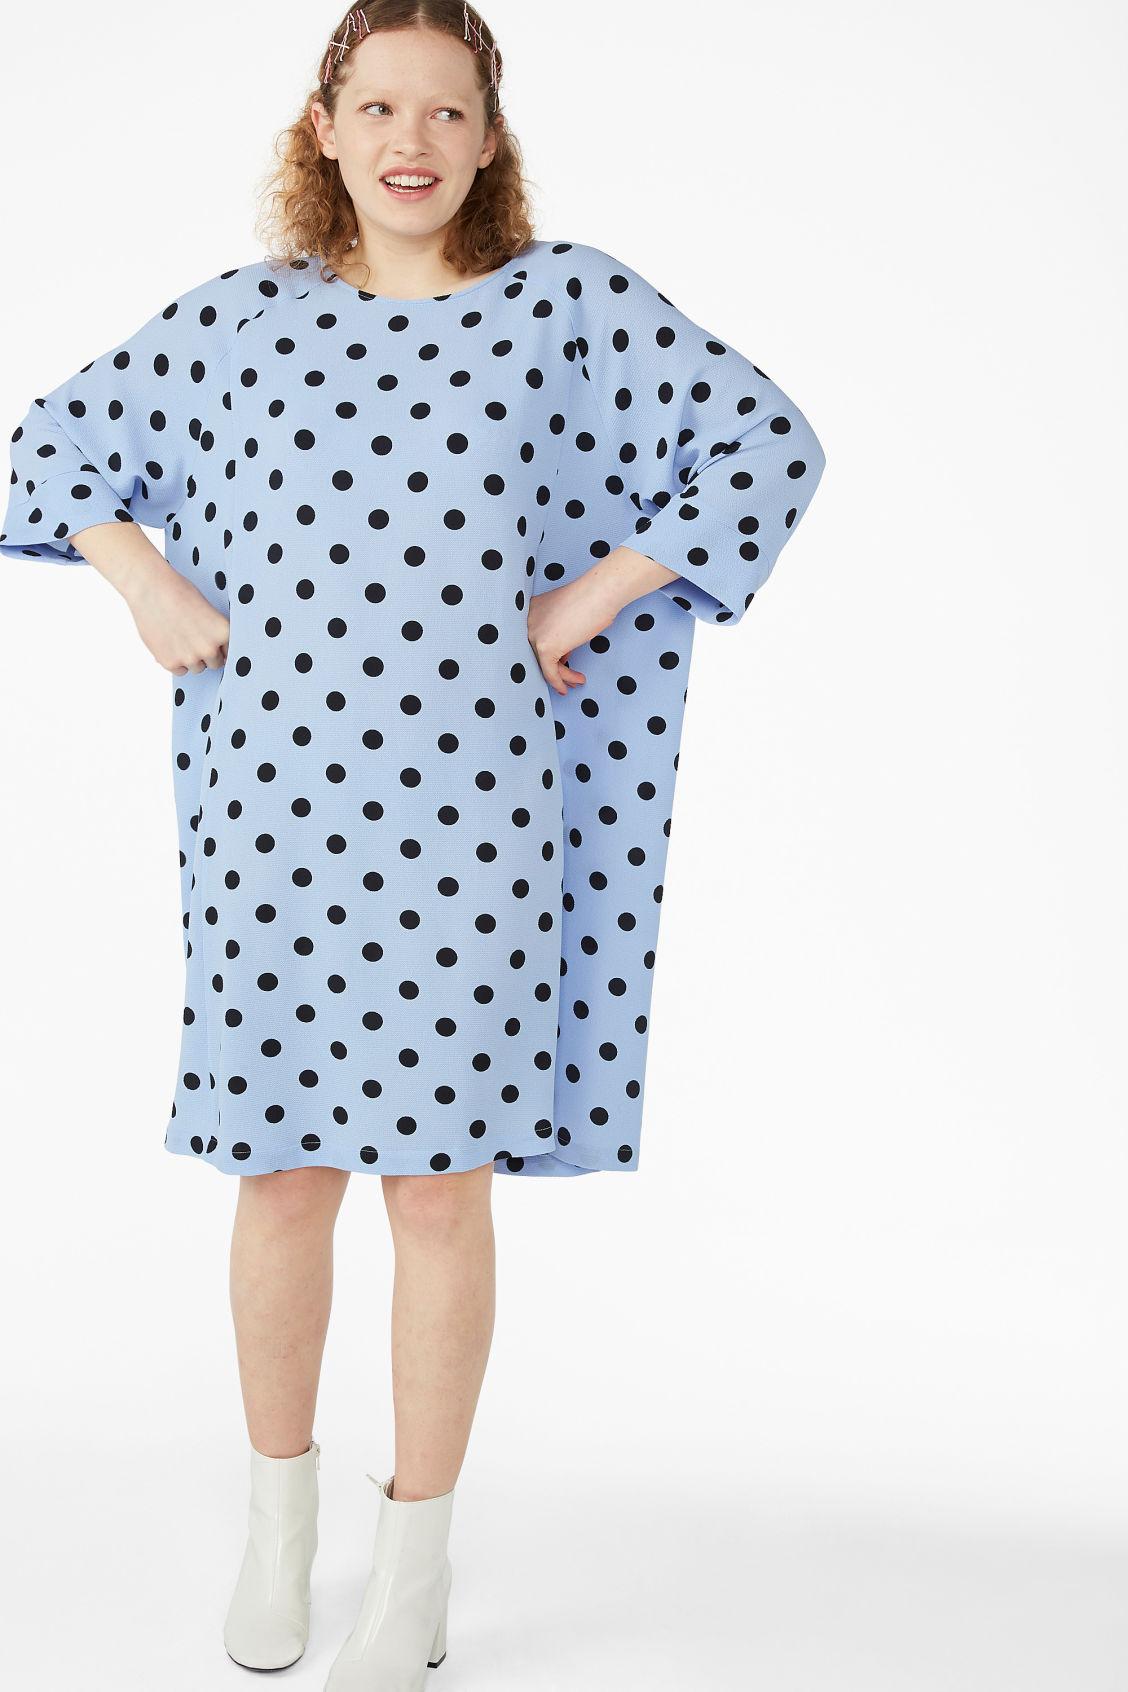 Flowy raglan dress - Blue with black dots - Dresses - Monki 599603525685